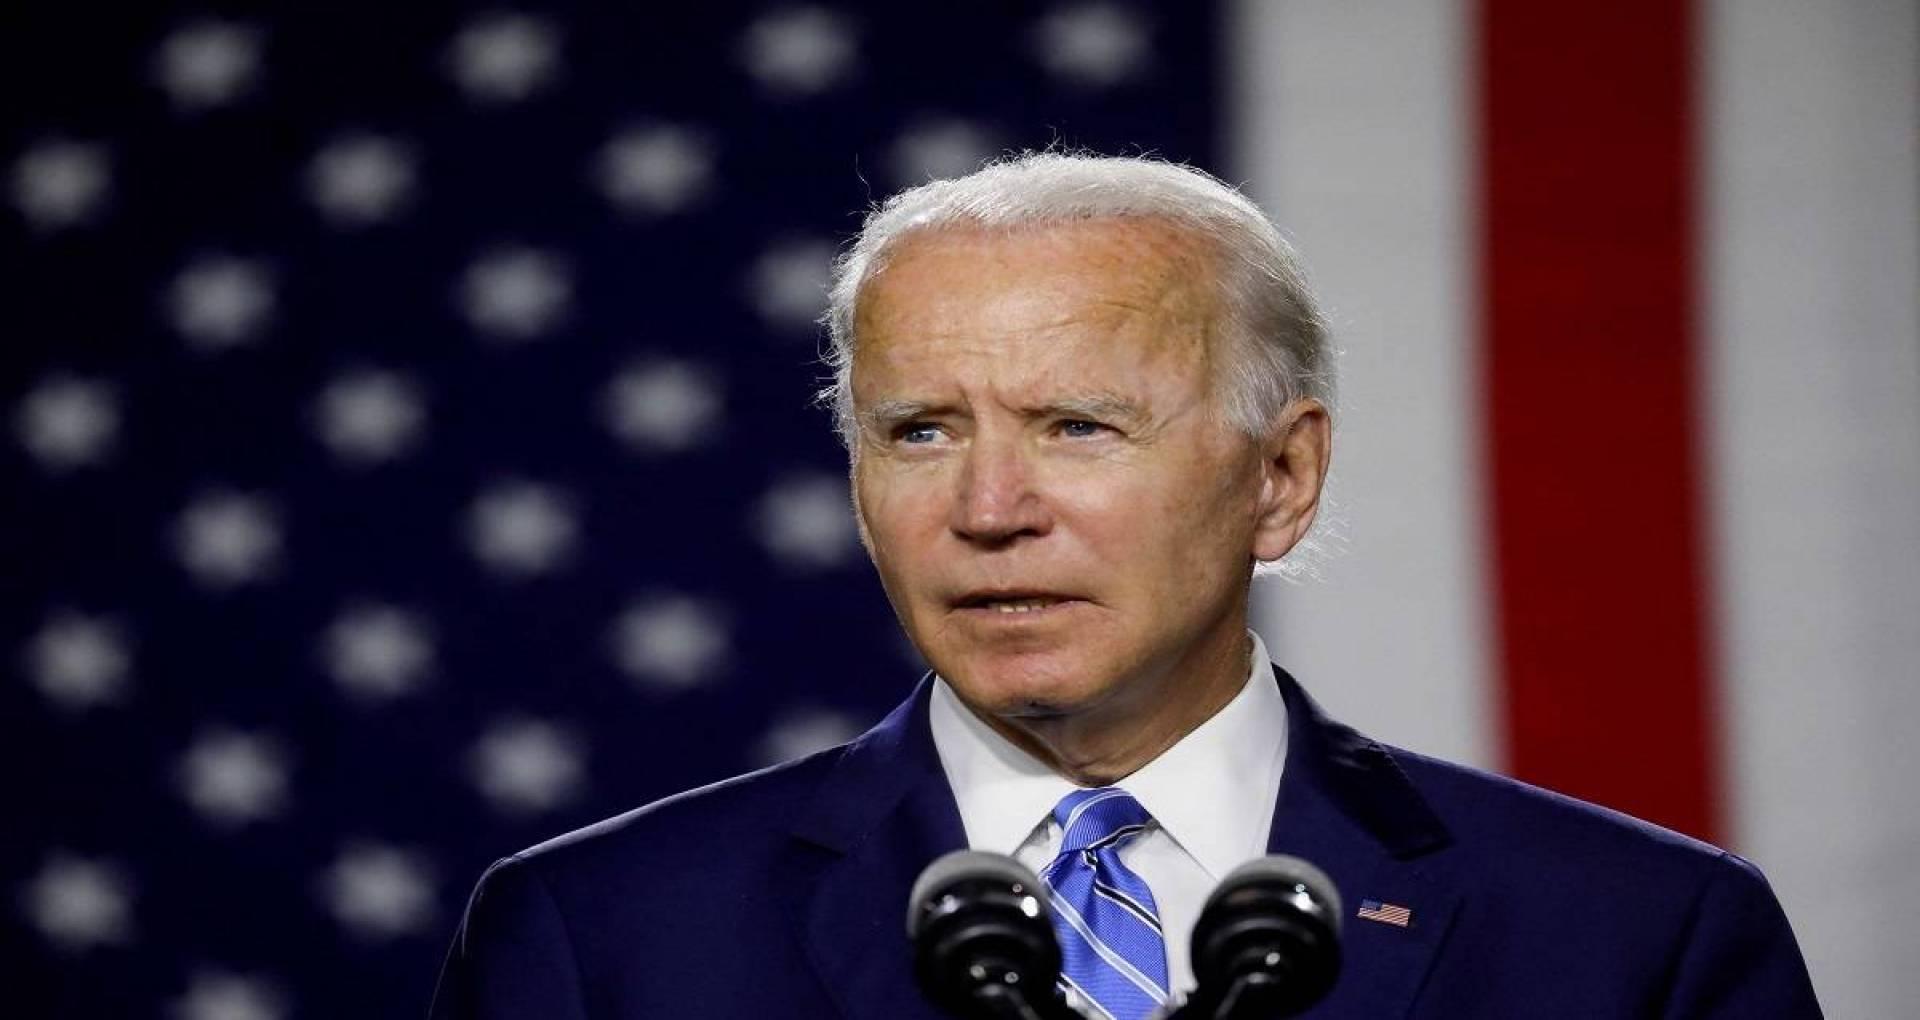 فريق بايدن: قرار ترامب يتيح «انتقالاً سلساً وسلمياً للسلطة»